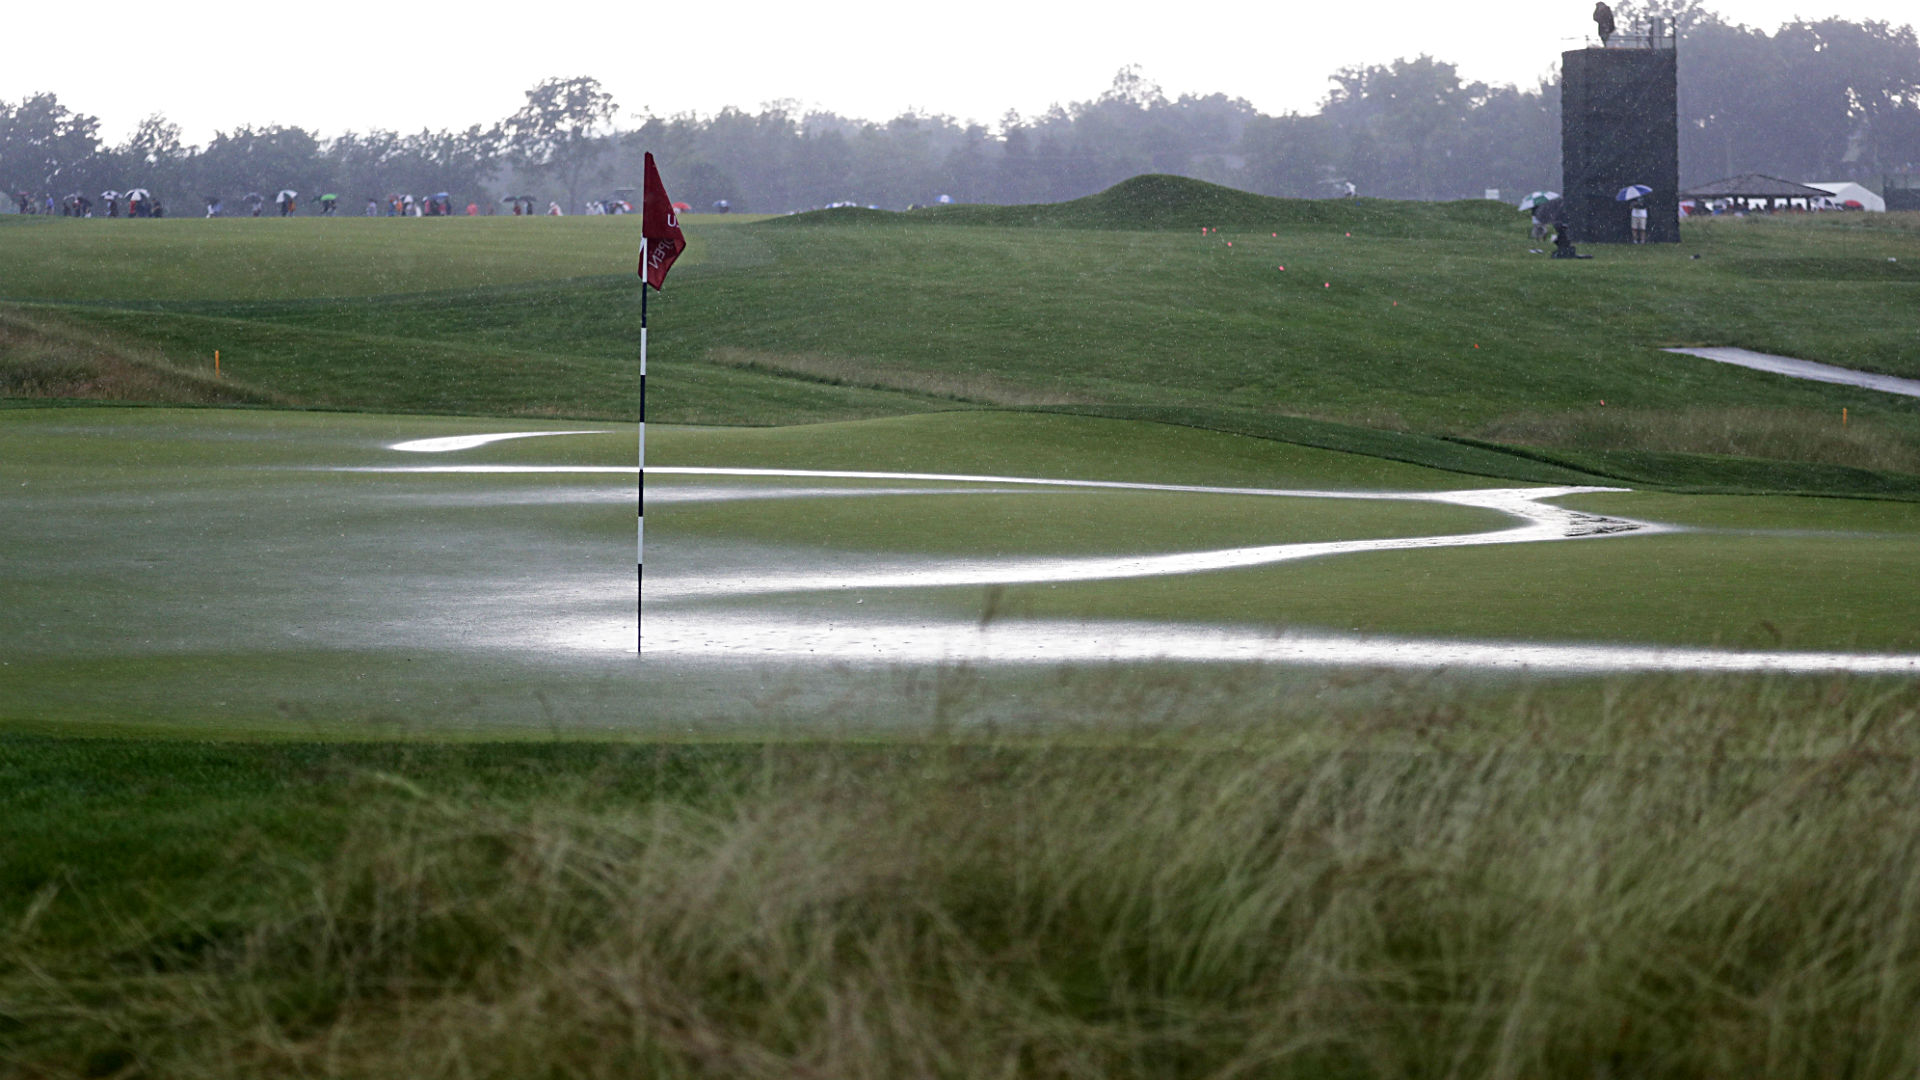 U.S. Open golf 2016: Schedule, pairings, tee times, TV for ...